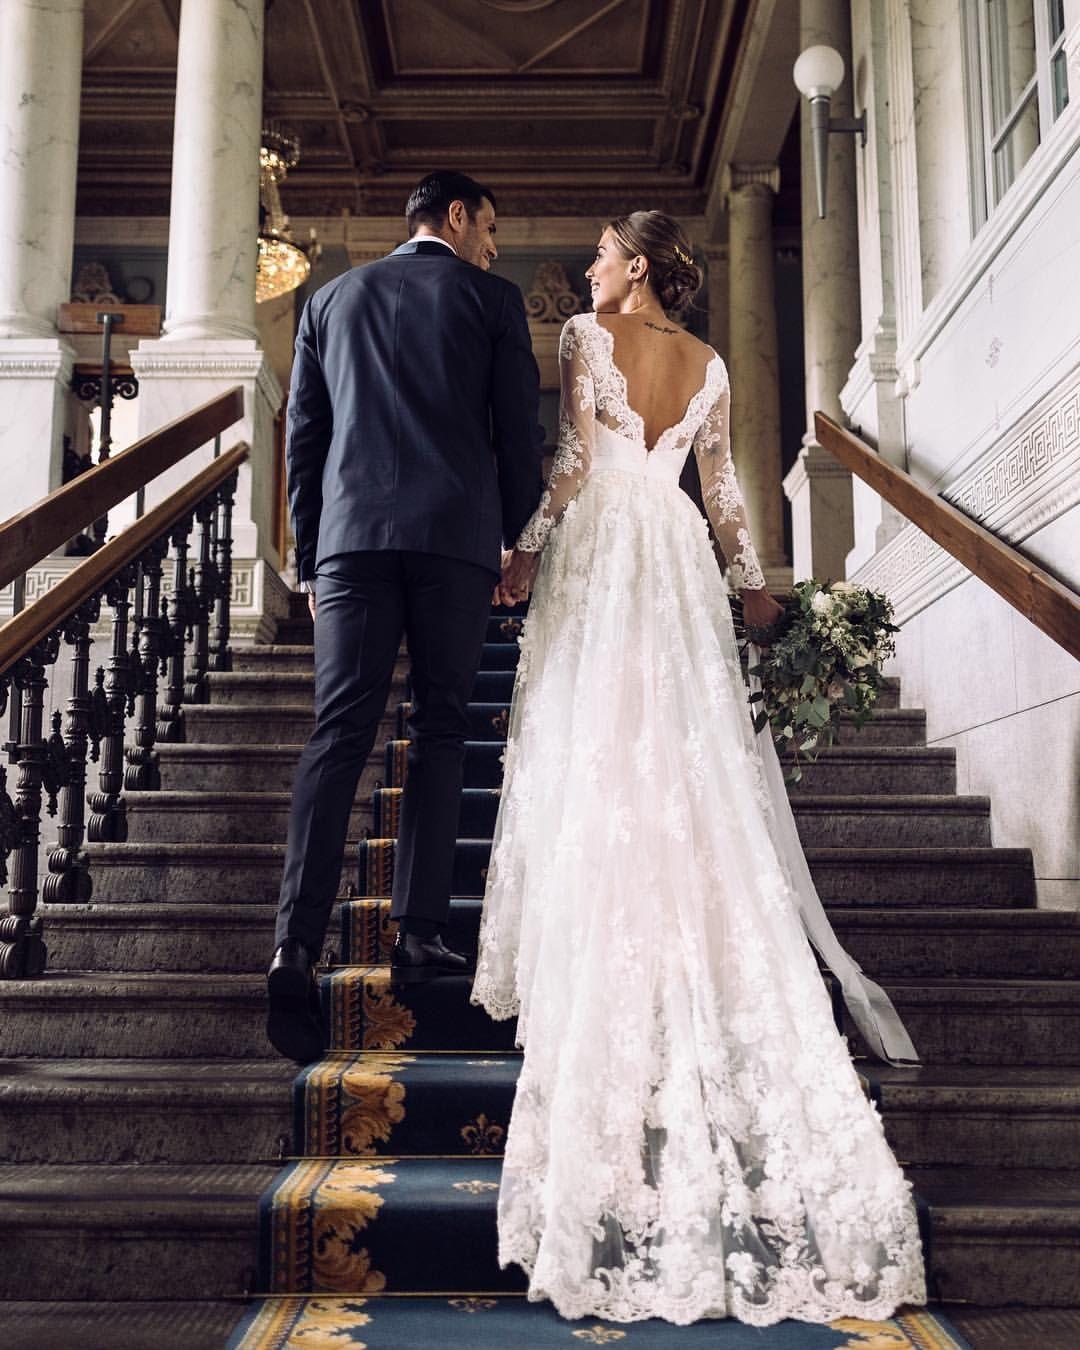 Pinterest::BriaAngelique | Wedding Photography | Pinterest | Wedding ...